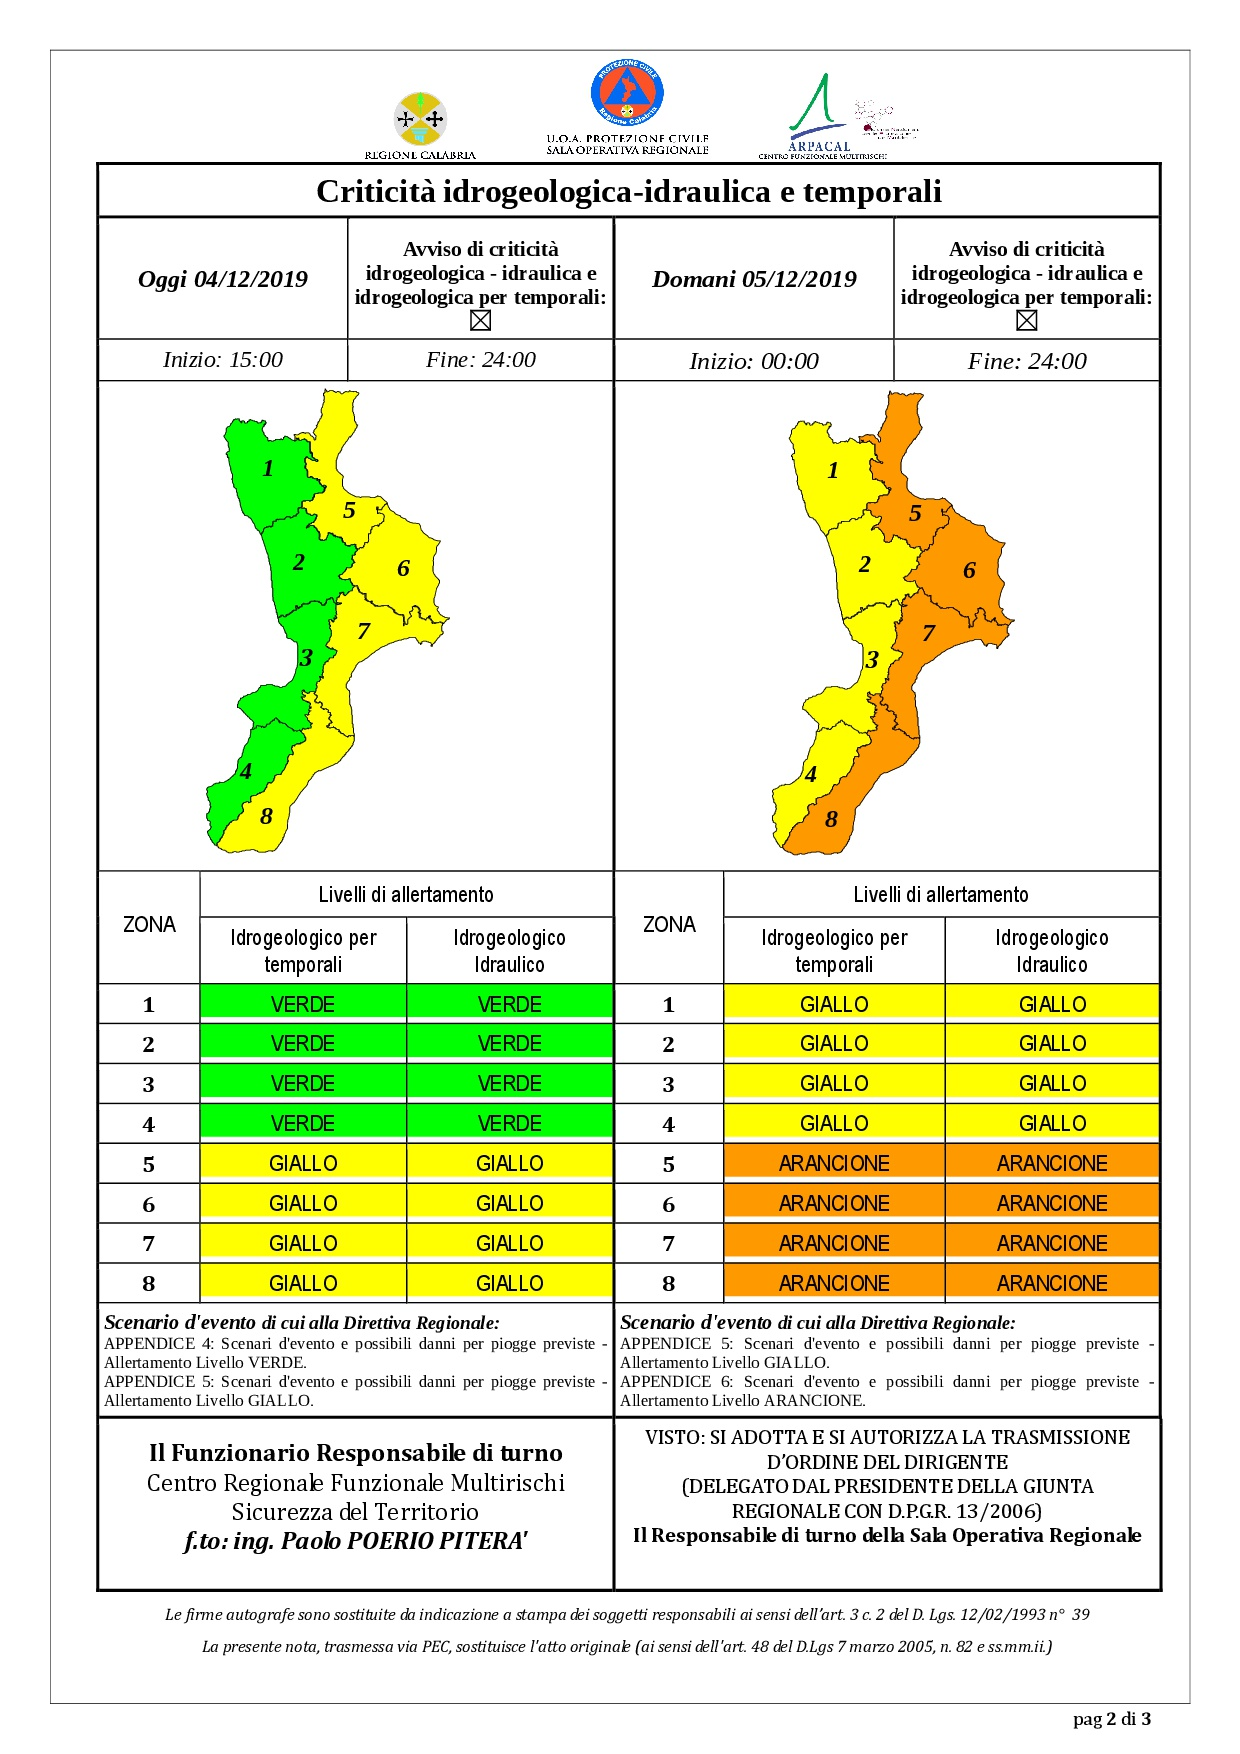 Criticità idrogeologica-idraulica e temporali in Calabria 04-12-2019